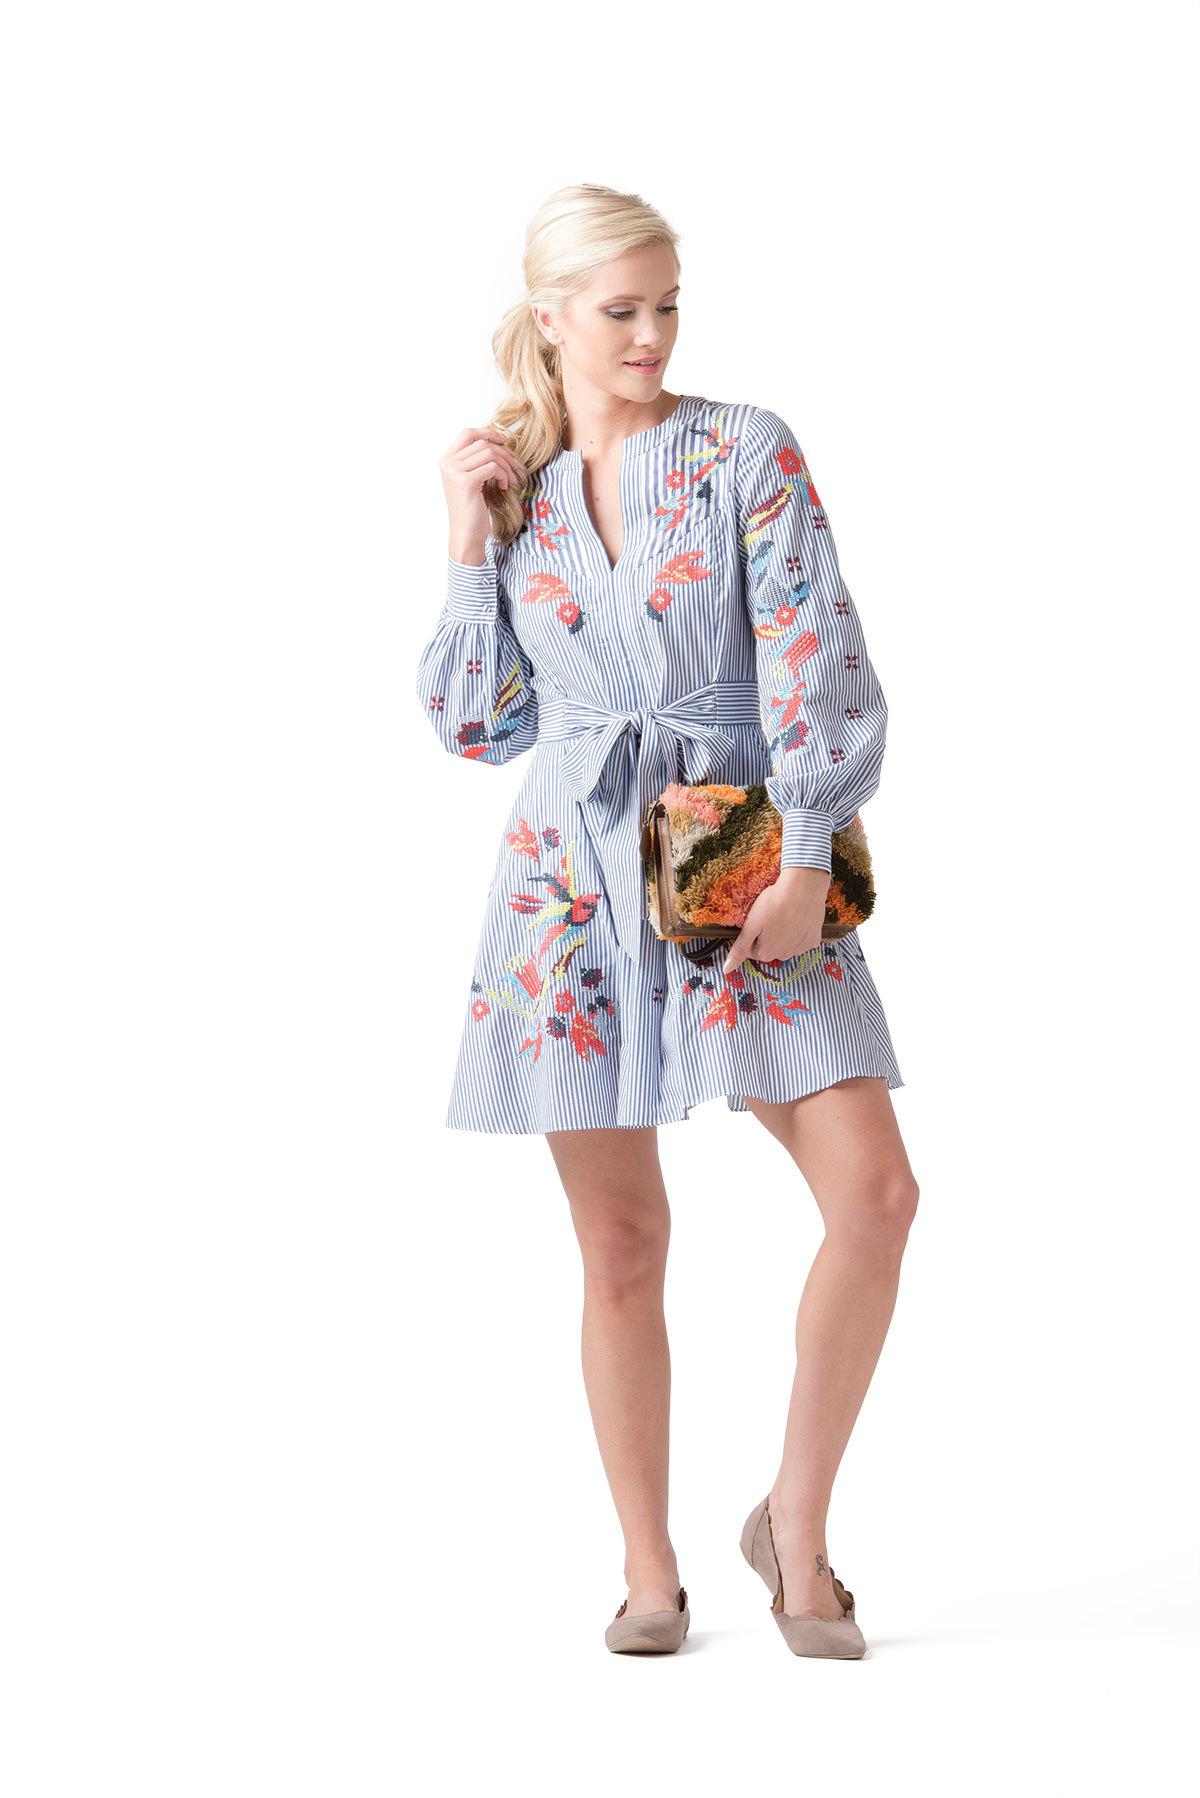 September 2017 Charmed Life Fashion 85